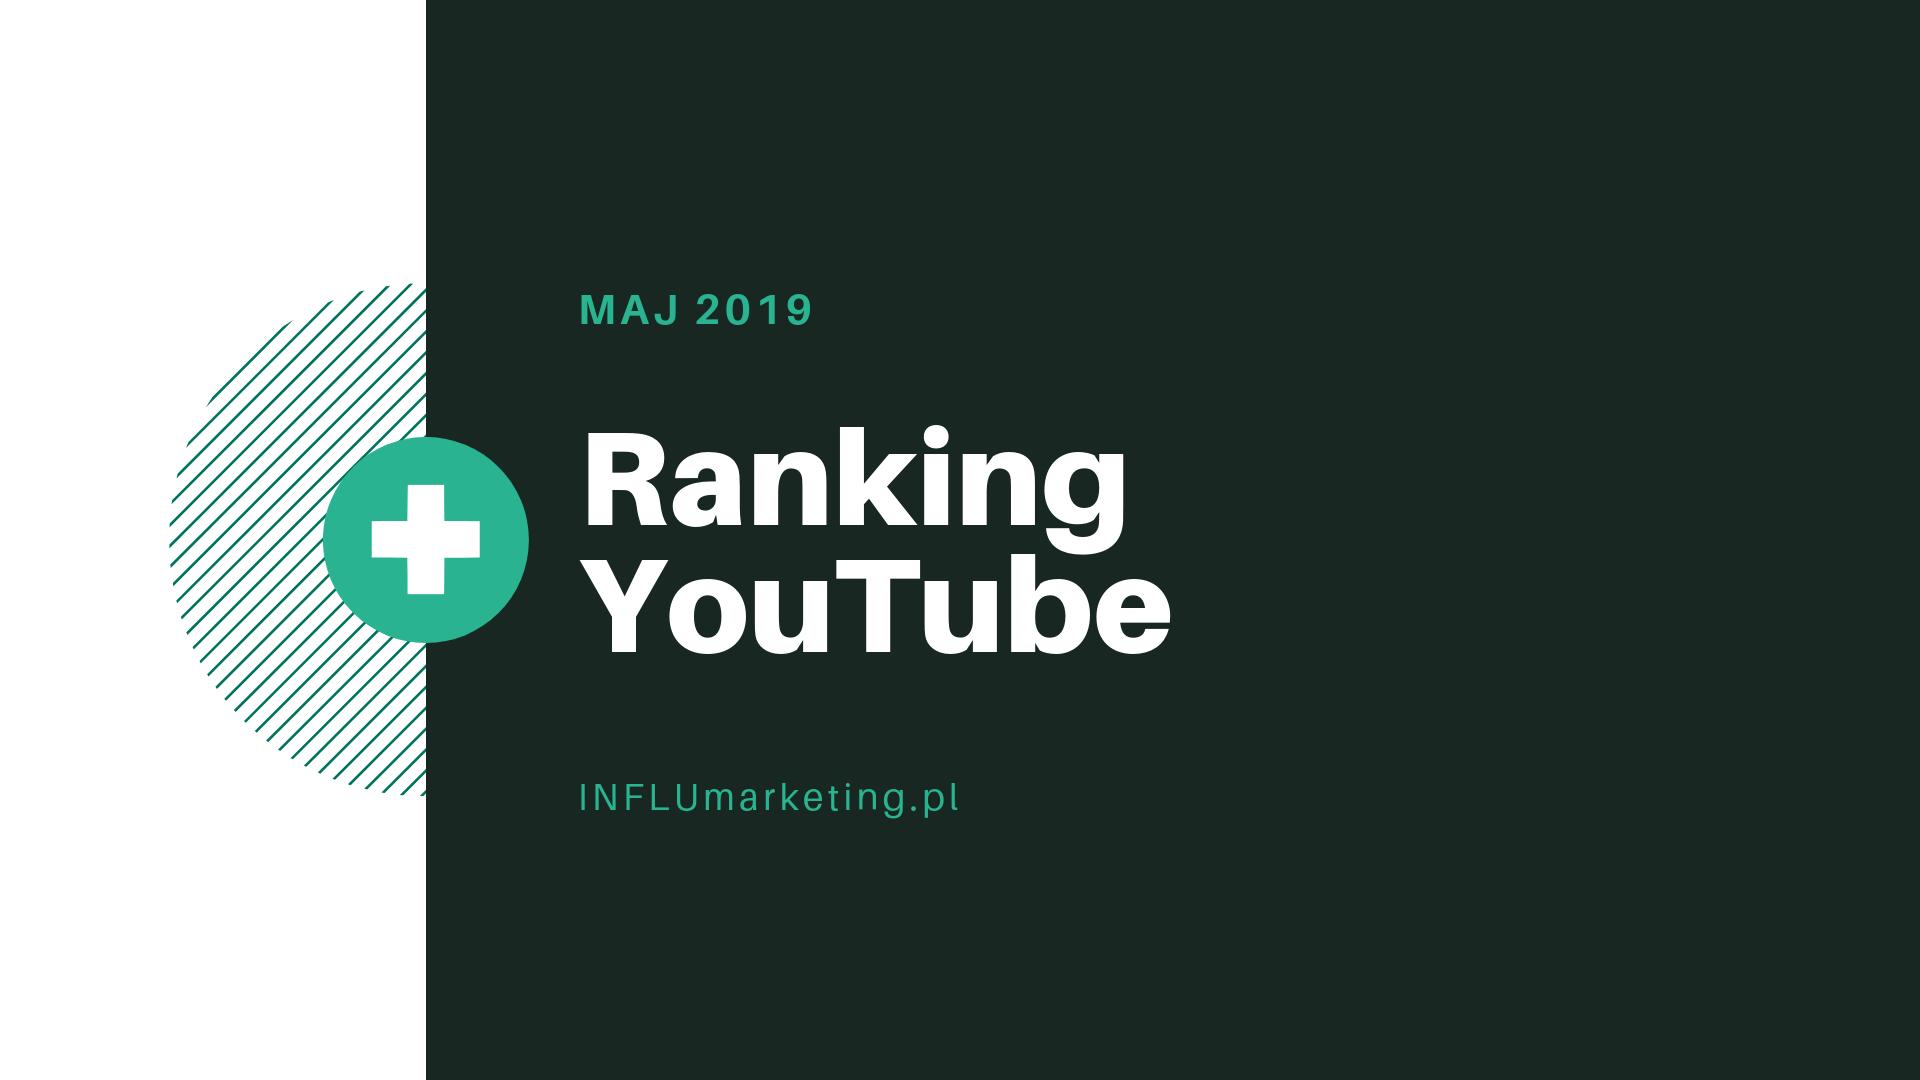 ranking youtube maj 2019